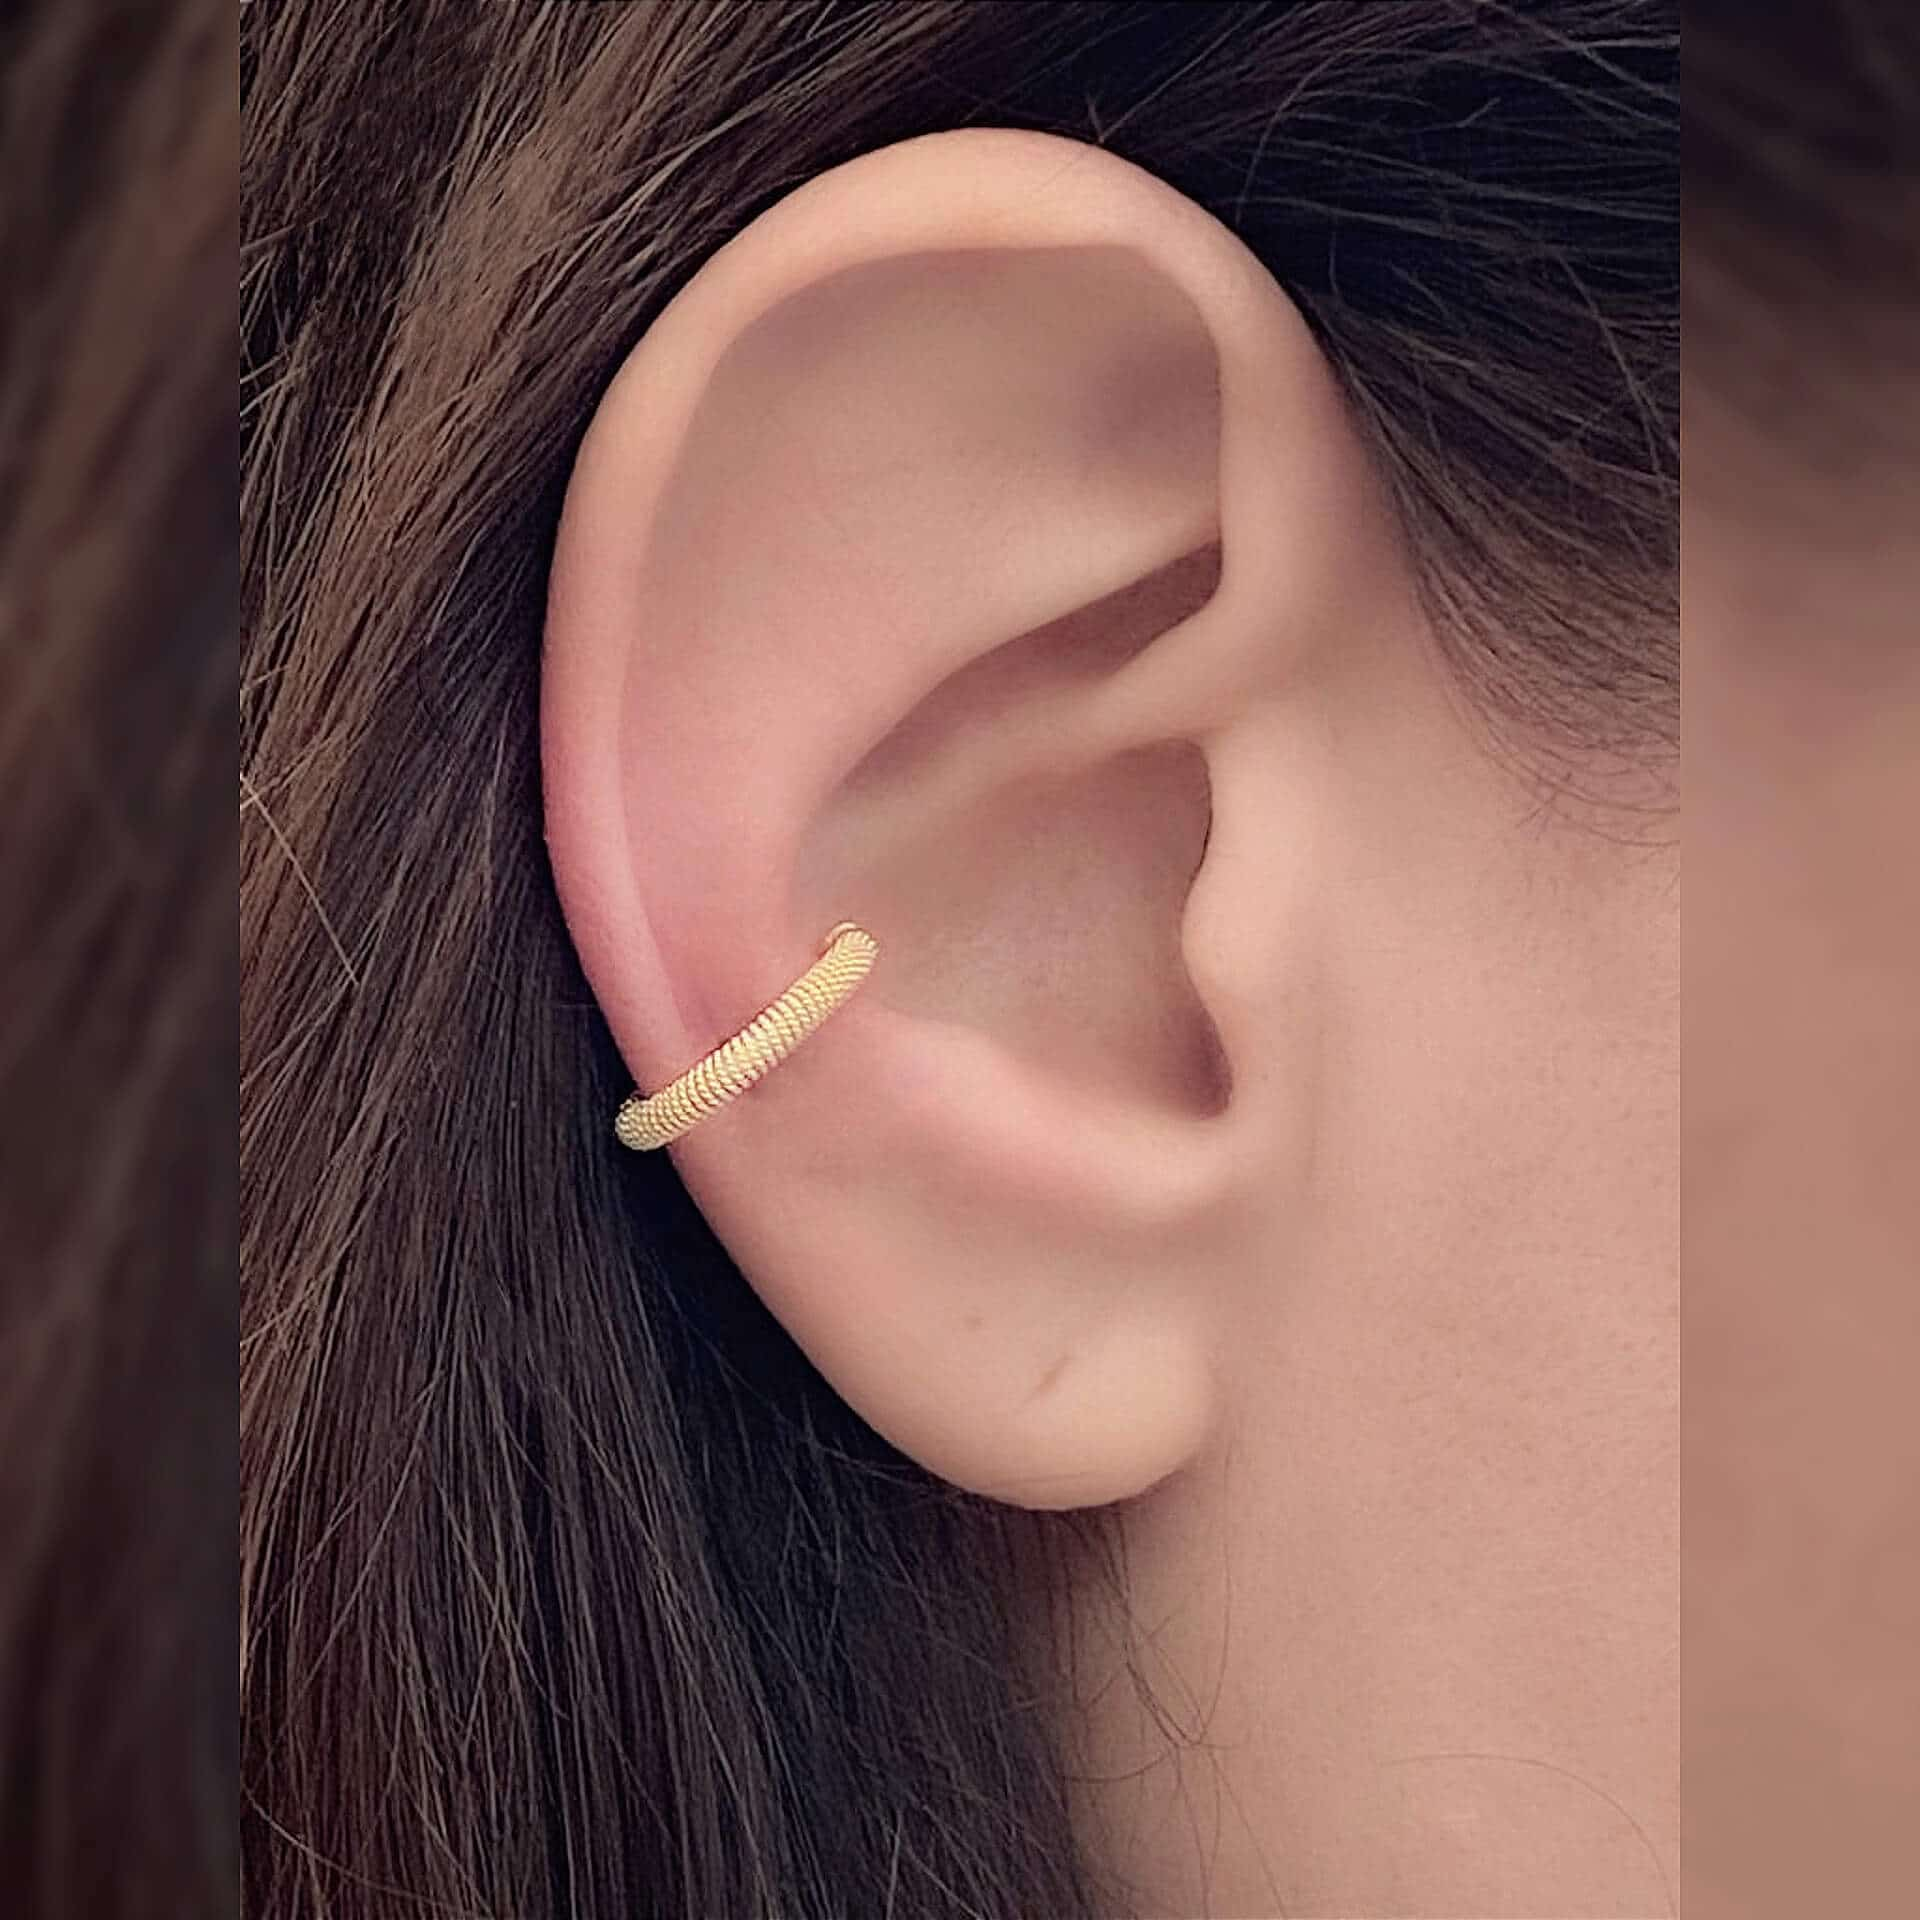 Caterina murino fili di querce boucle d'oreille or